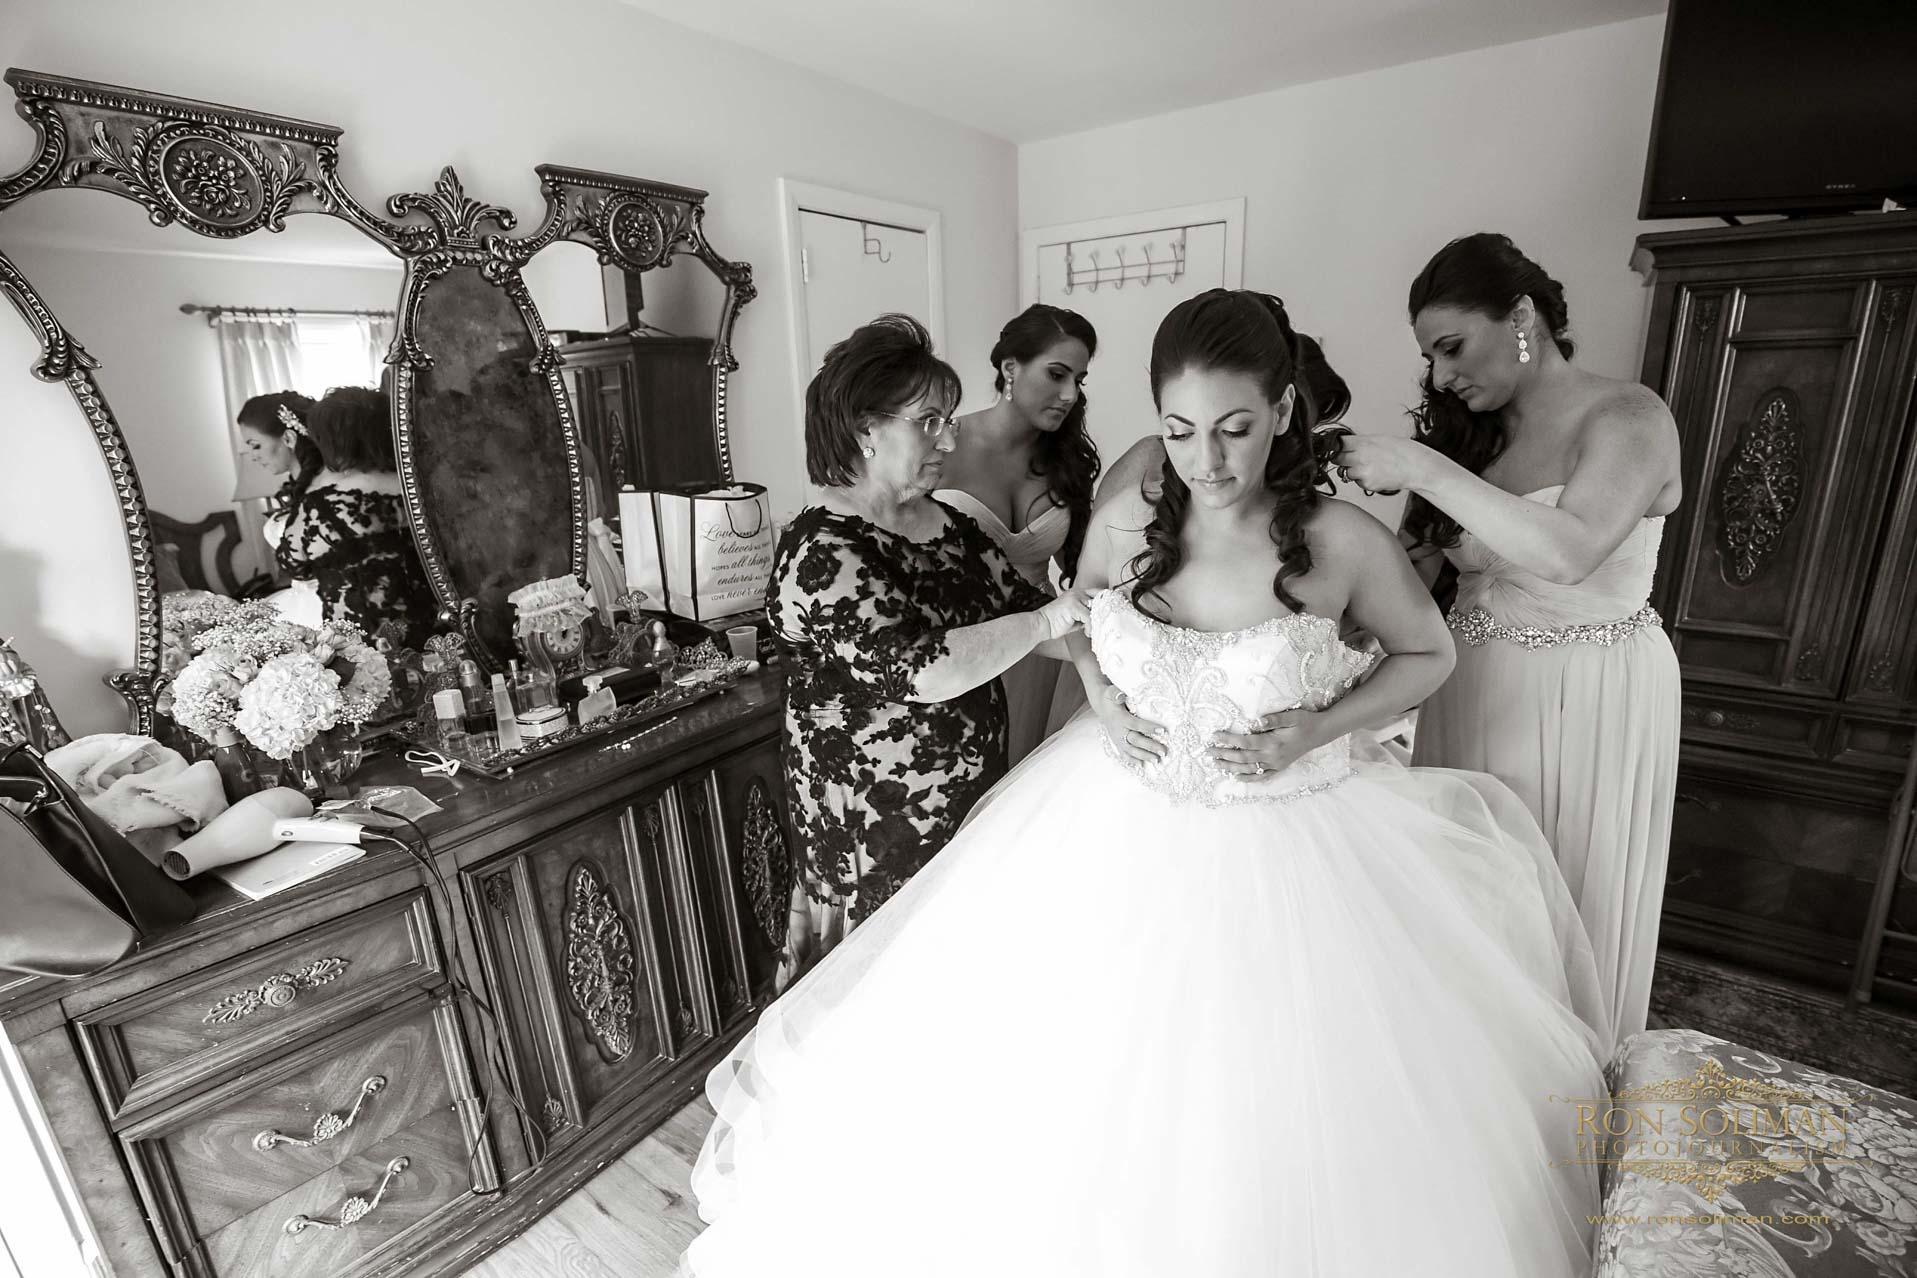 THE VENETIAN CATERING wedding photos